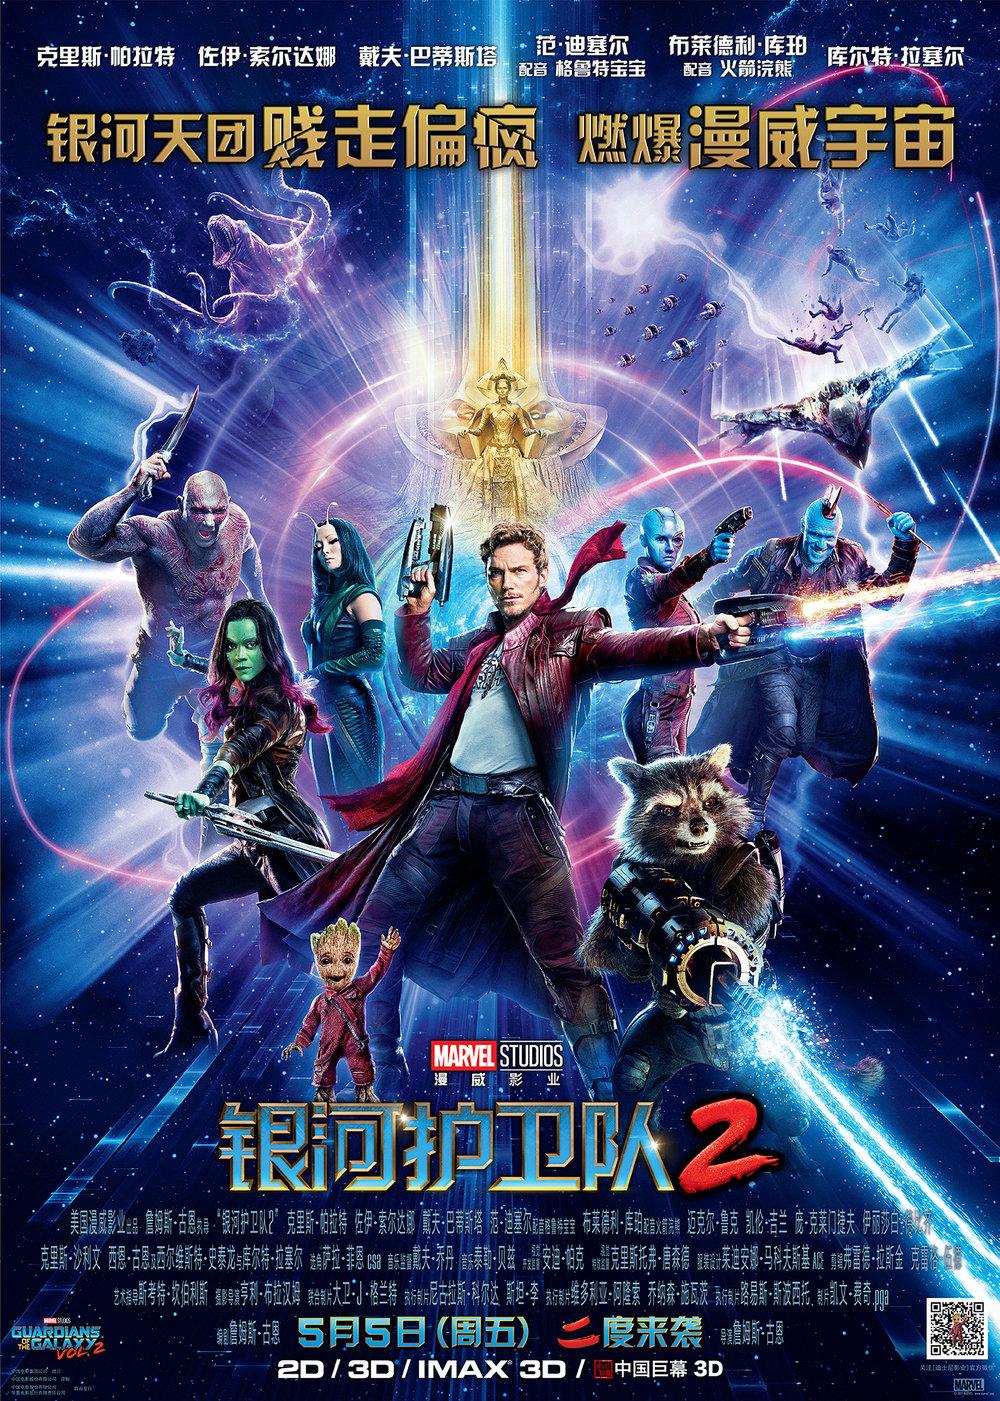 GuardiansVol2_China_1Sht_100dpi.jpg